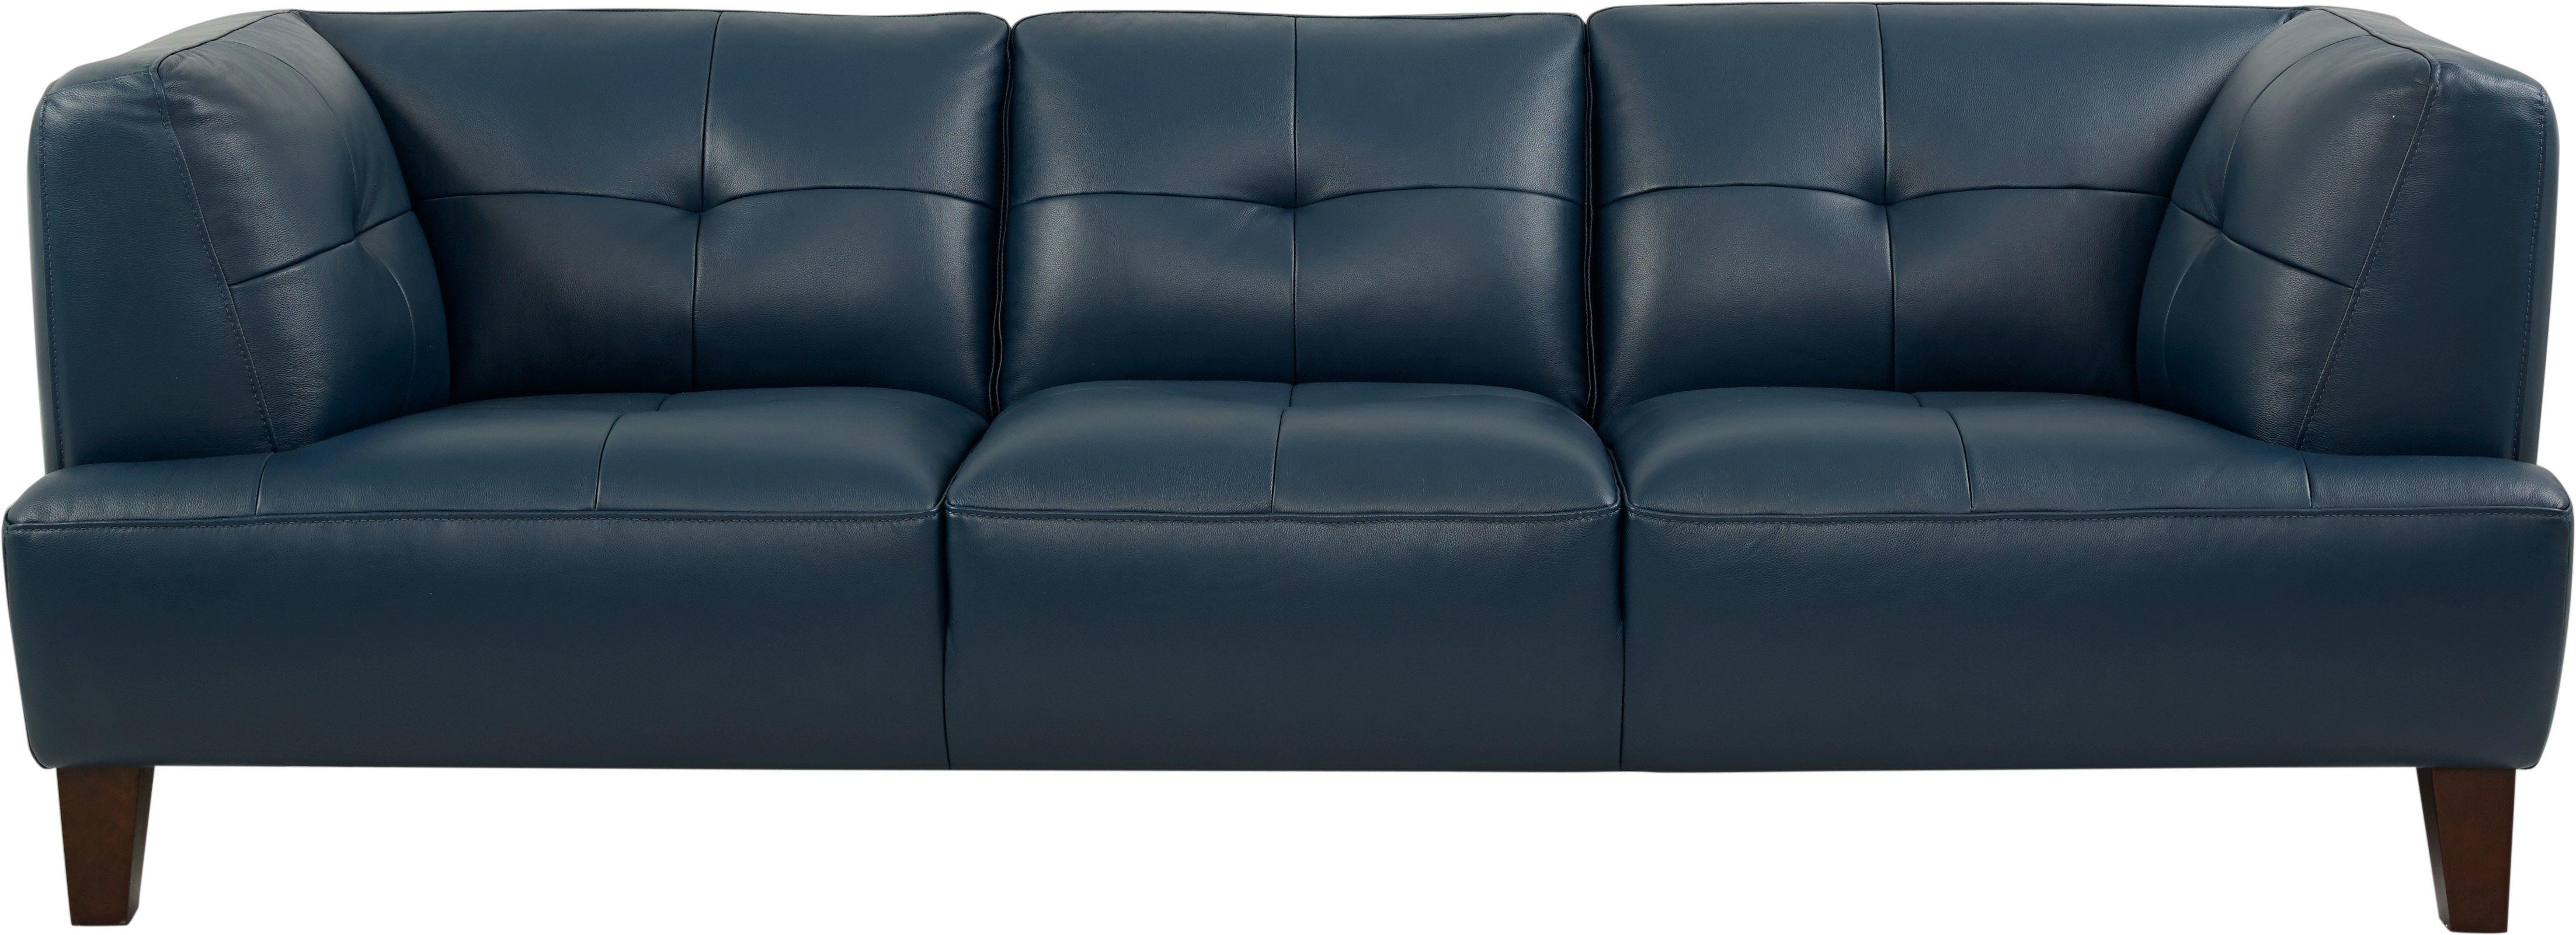 Blue Leather Couch Blue Leather Sofa Leather Sofa Blue Leather Couch